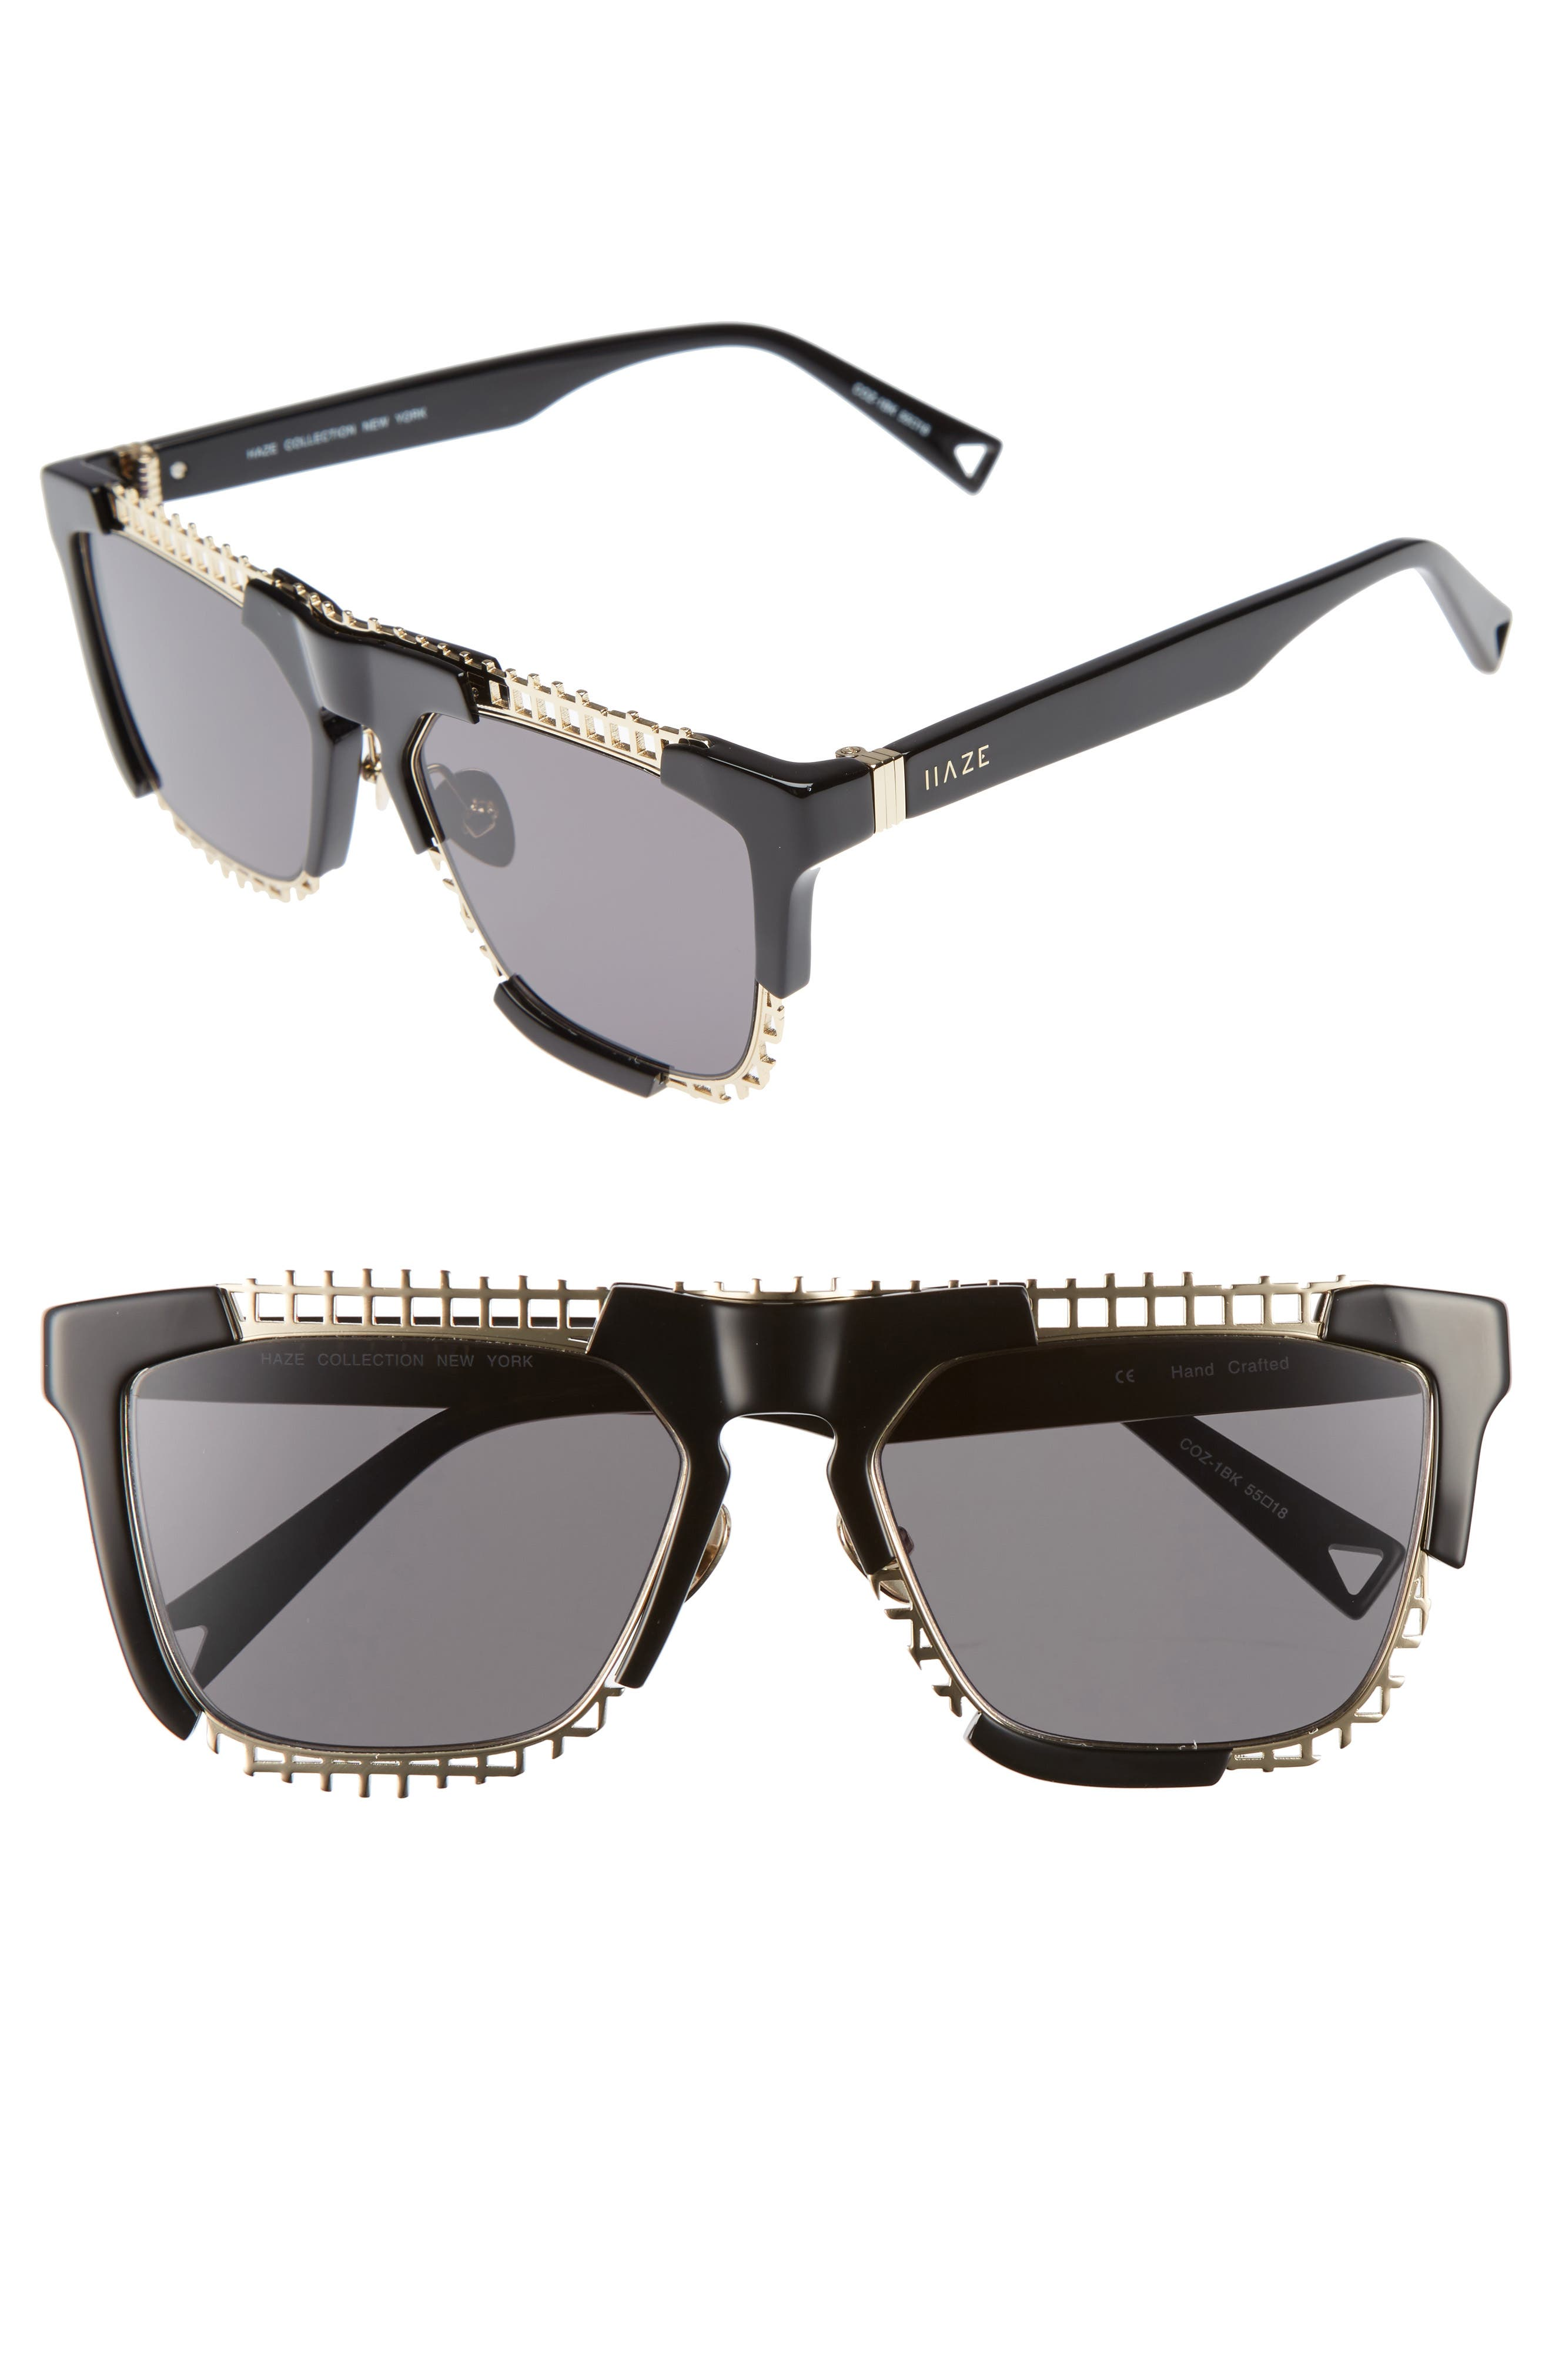 Coz 55mm Square Sunglasses,                             Main thumbnail 1, color,                             001